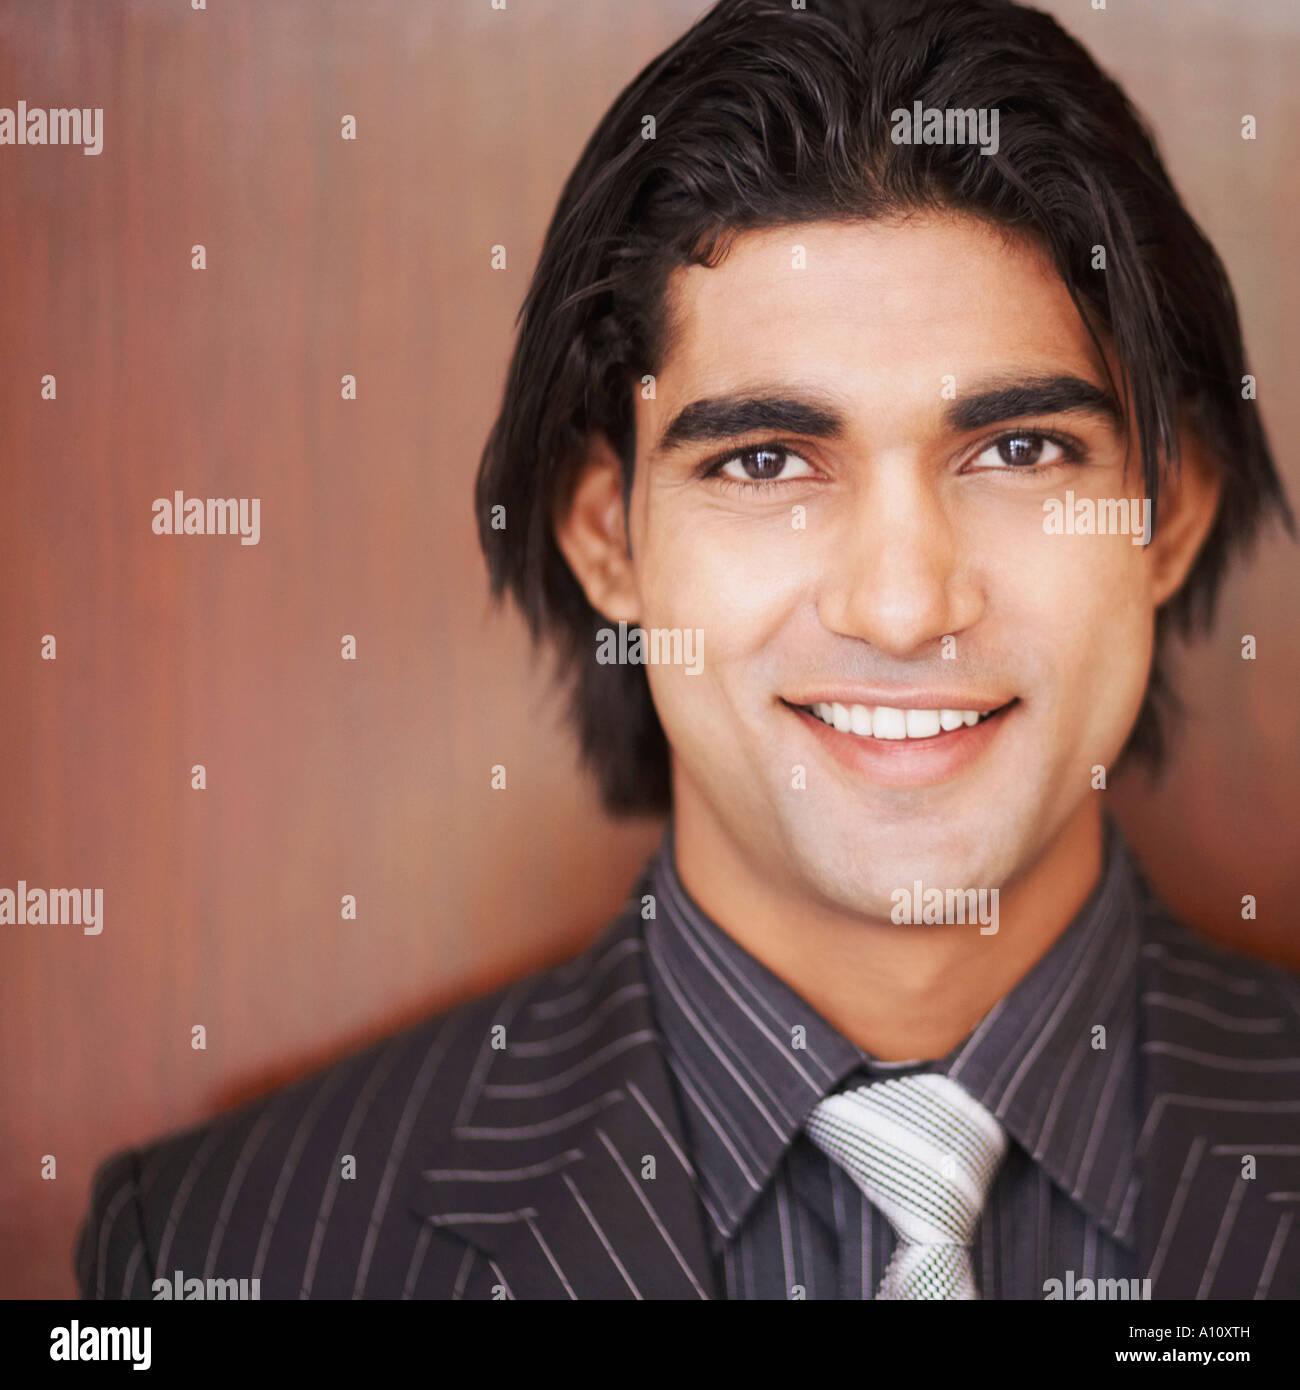 Portrait of a businessman smiling - Stock Image